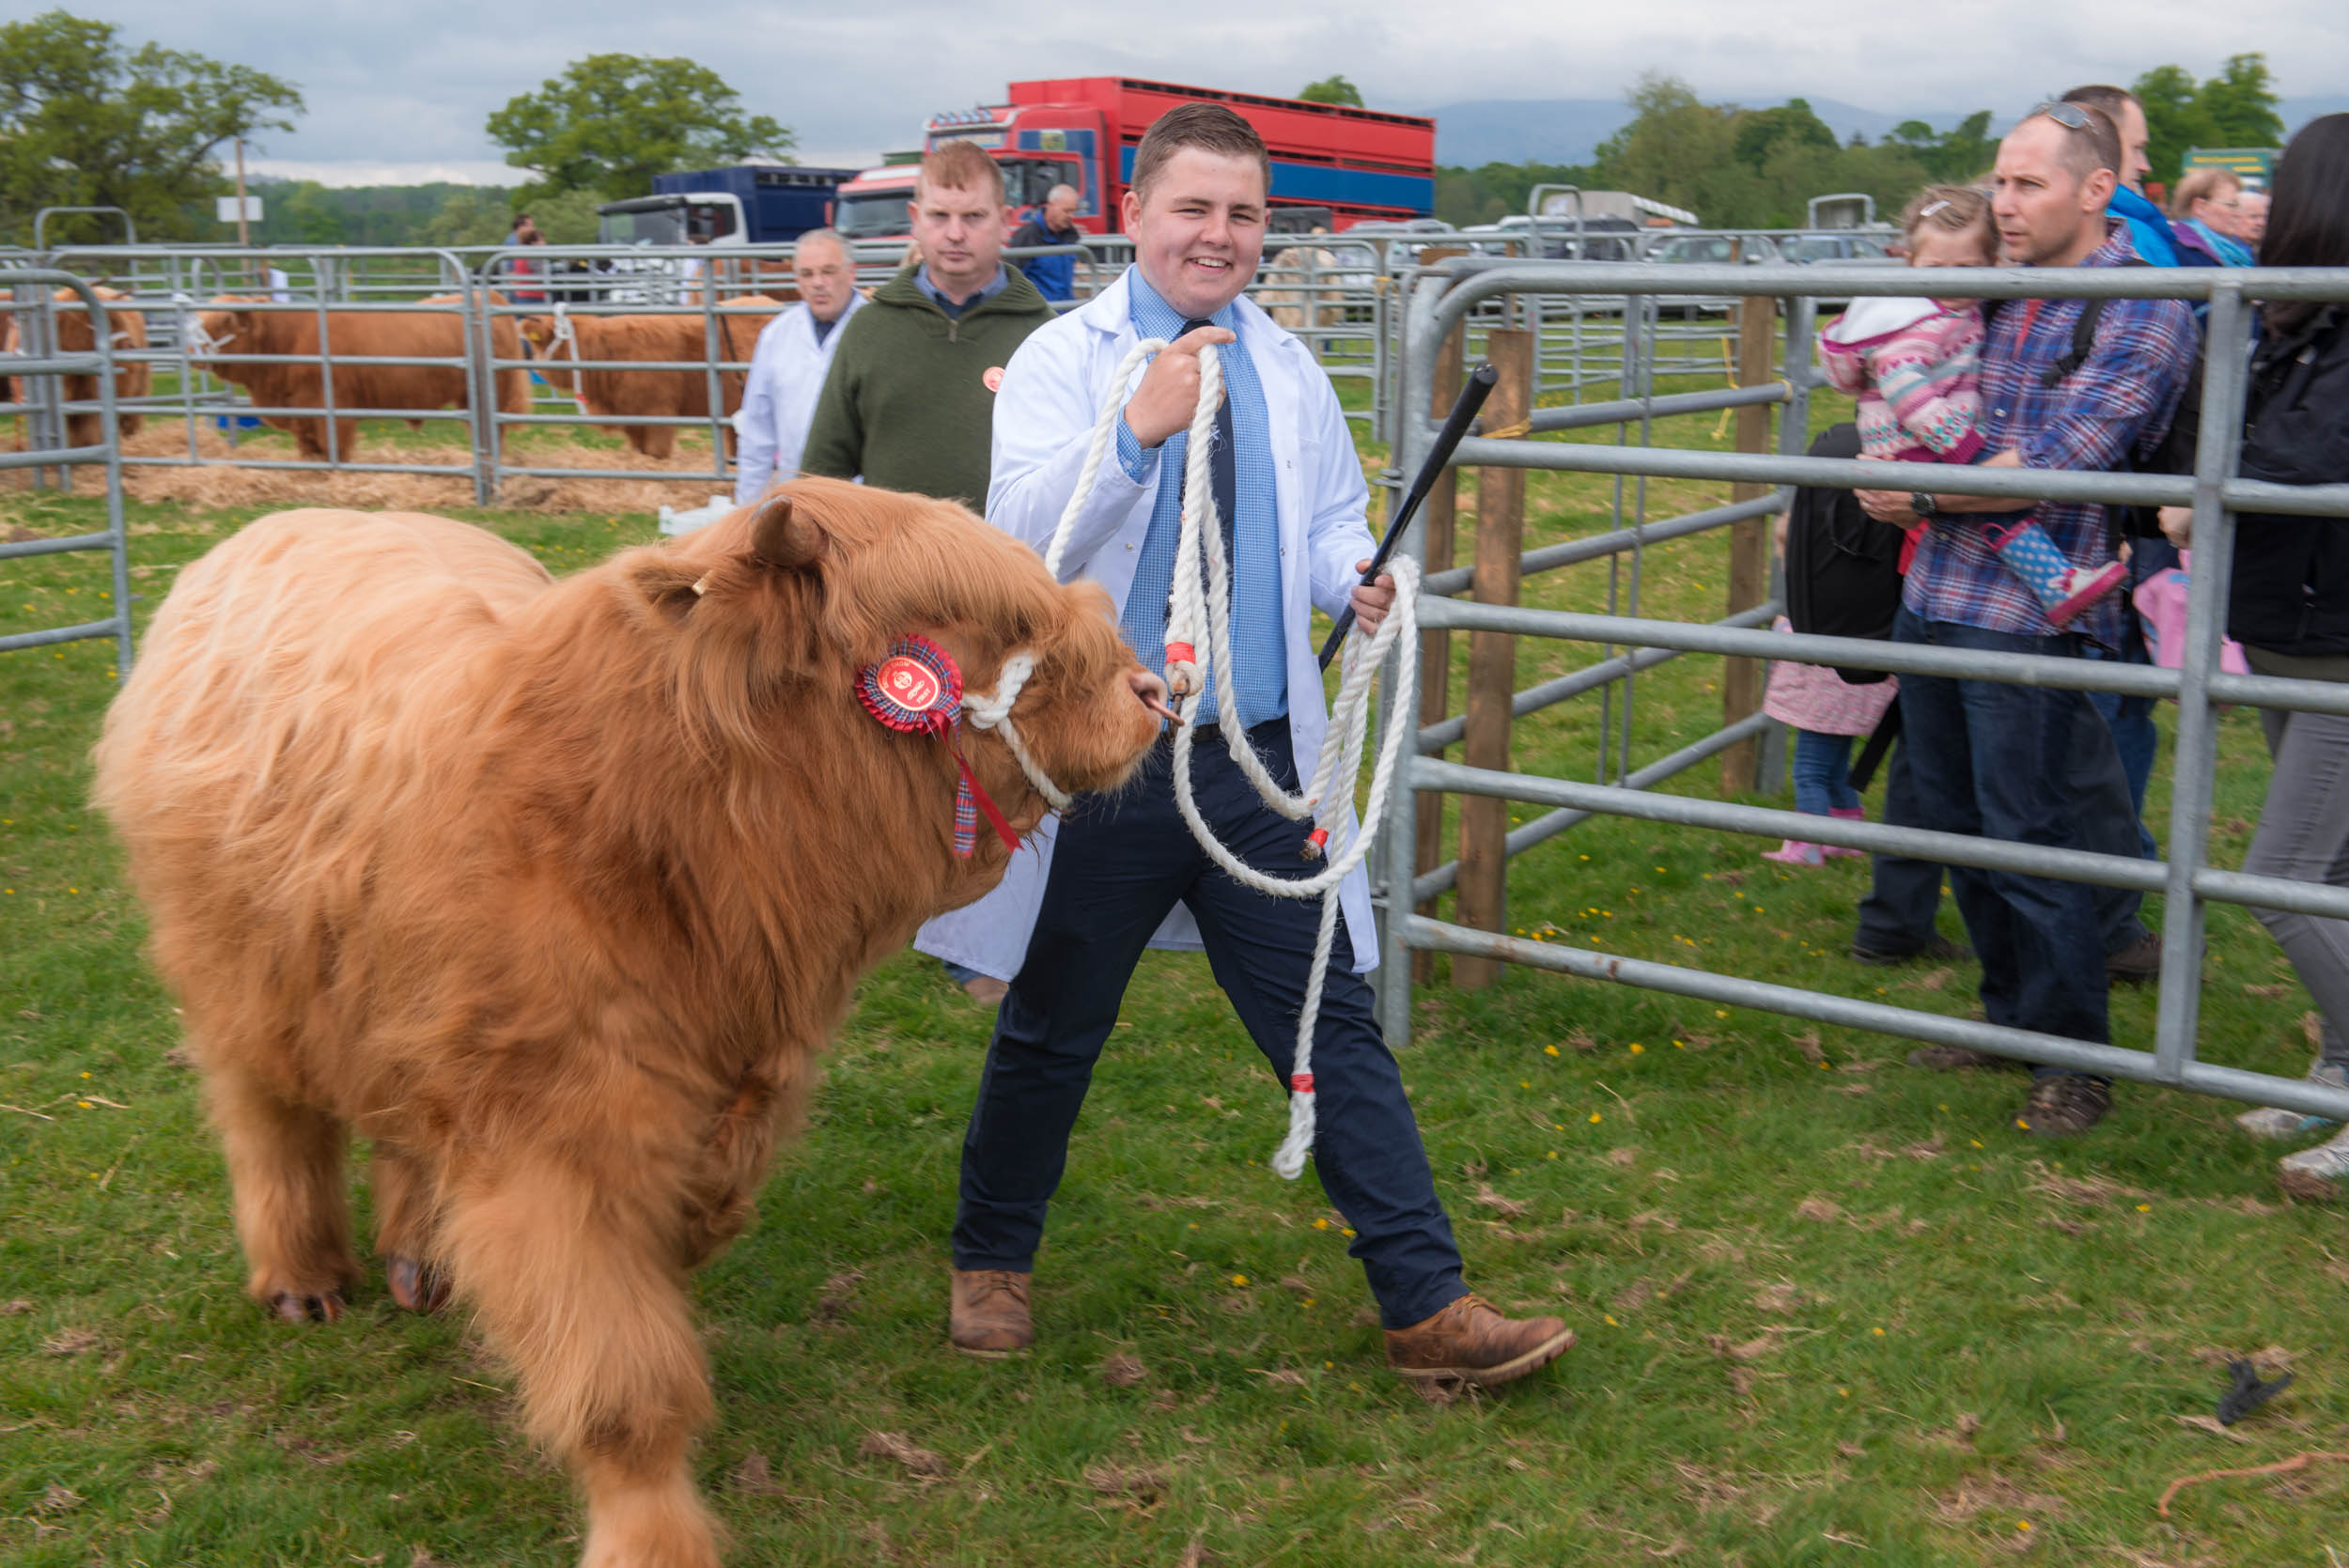 Drymen Show Livestock & Animals